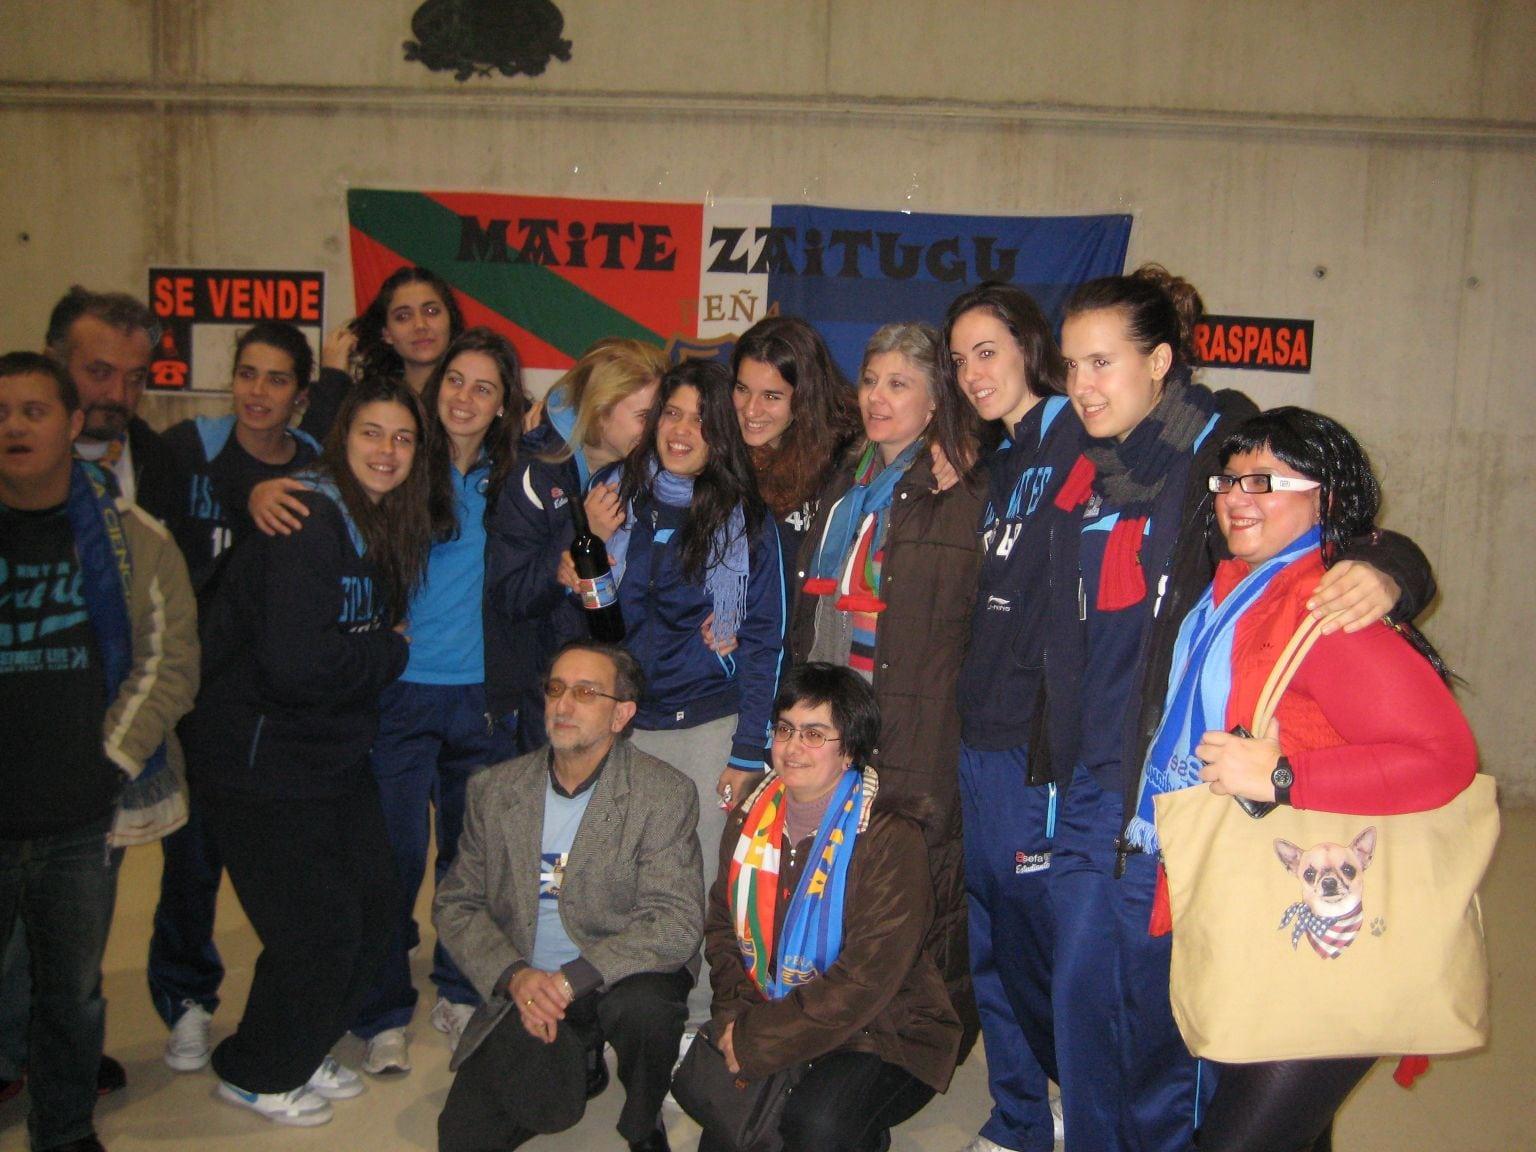 Fotos: En Euskadi, Asefa Estudiantes nunca caminará solo